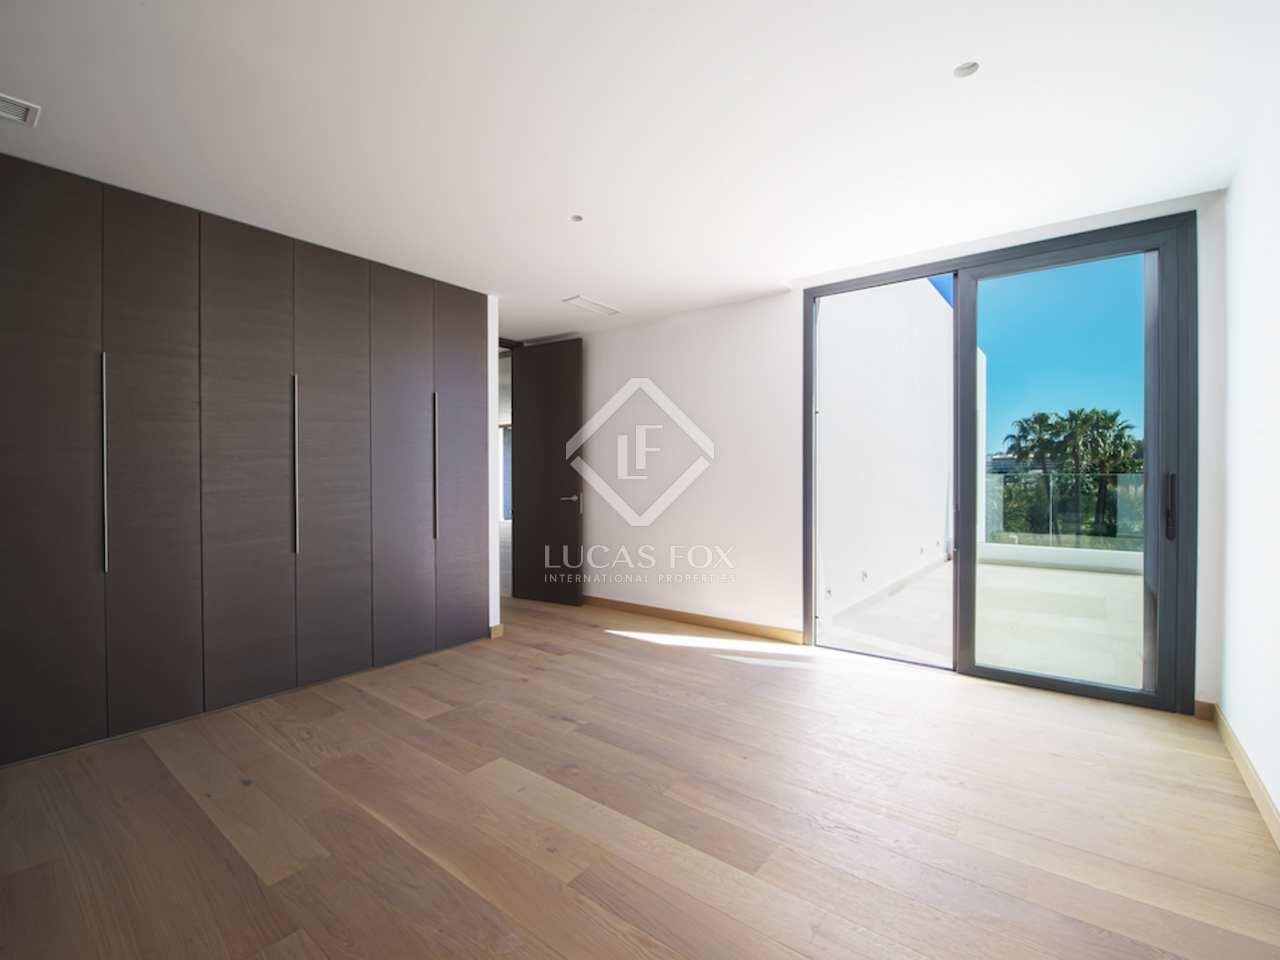 840m haus villa zum verkauf in nueva andaluc a for Interior design lernen